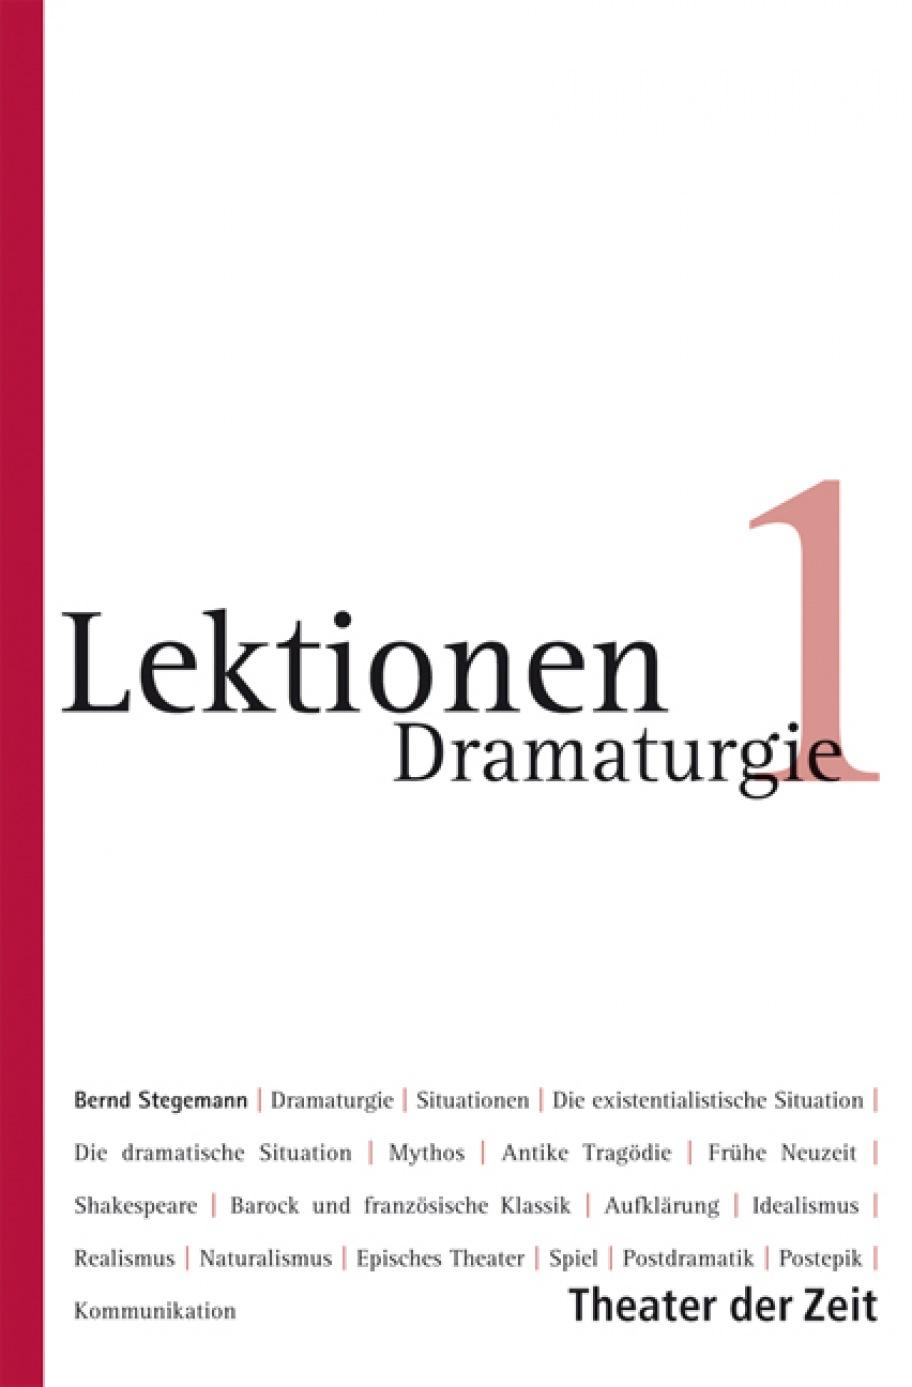 Bernd Stegemann: Dramaturgie